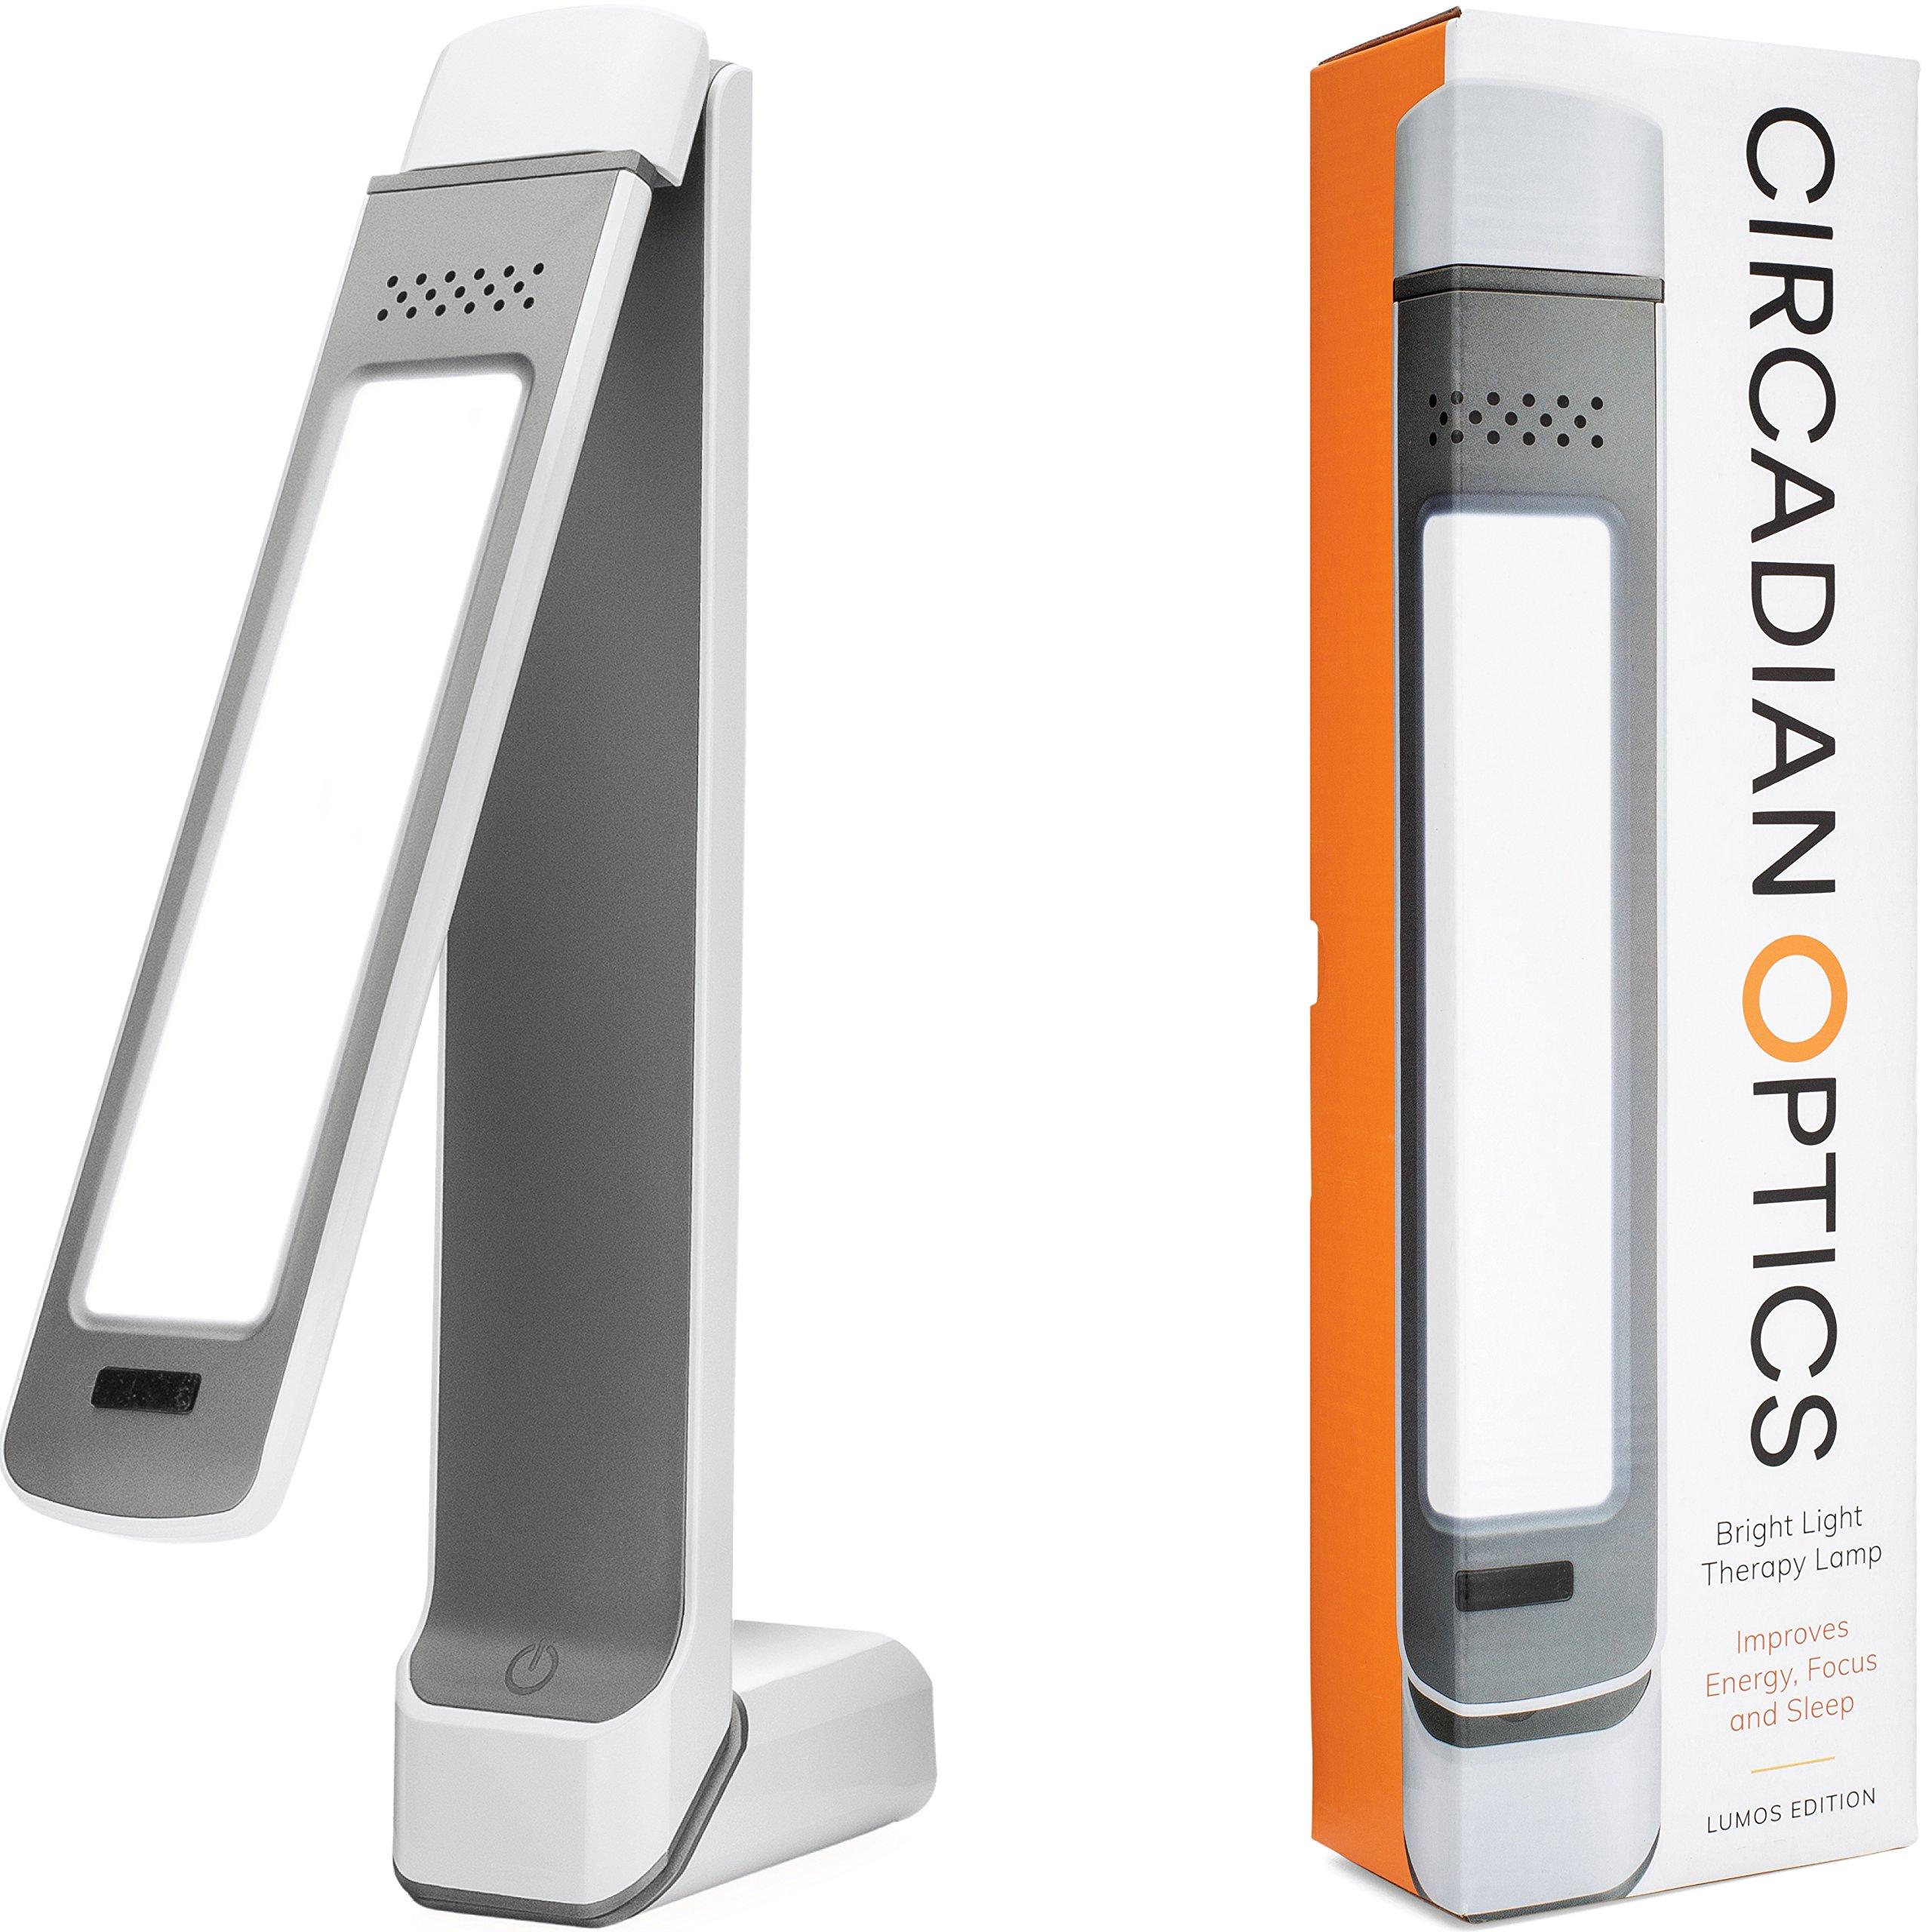 Circadian Optics Lumos 2.0 Light Therapy Lamp | As Seen On Shark Tank | 10,000 LUX Ultra Bright LED | Full Spectrum UV Free | Adjustable Light Panel | Turn On Your Day by Circadian Optics